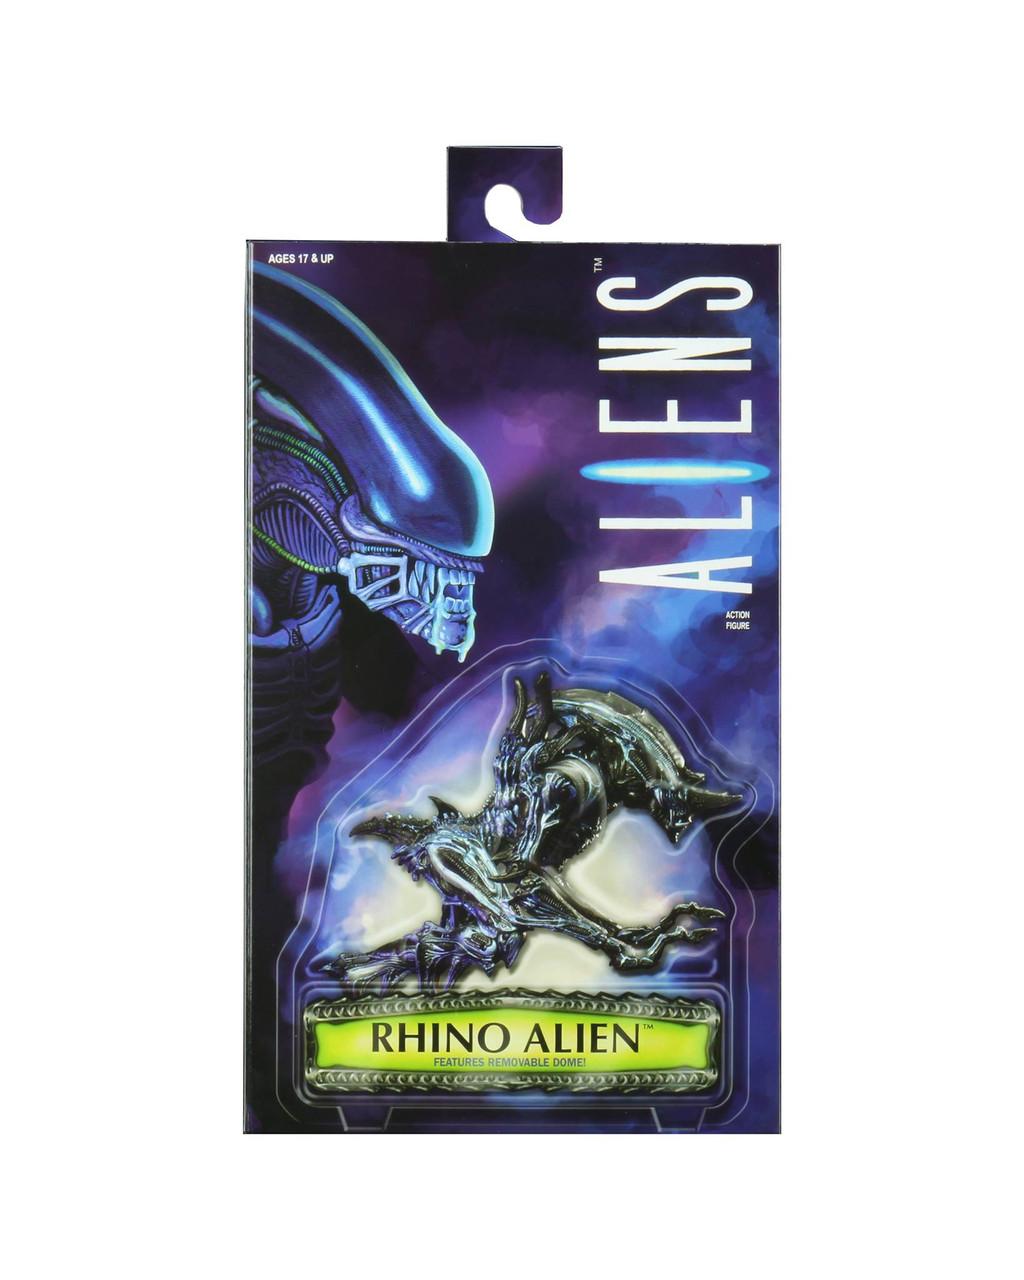 "NECA - Aliens - 7"" Scale Action Figure - Kenner Tribute Series Rhino Alien Version 2"